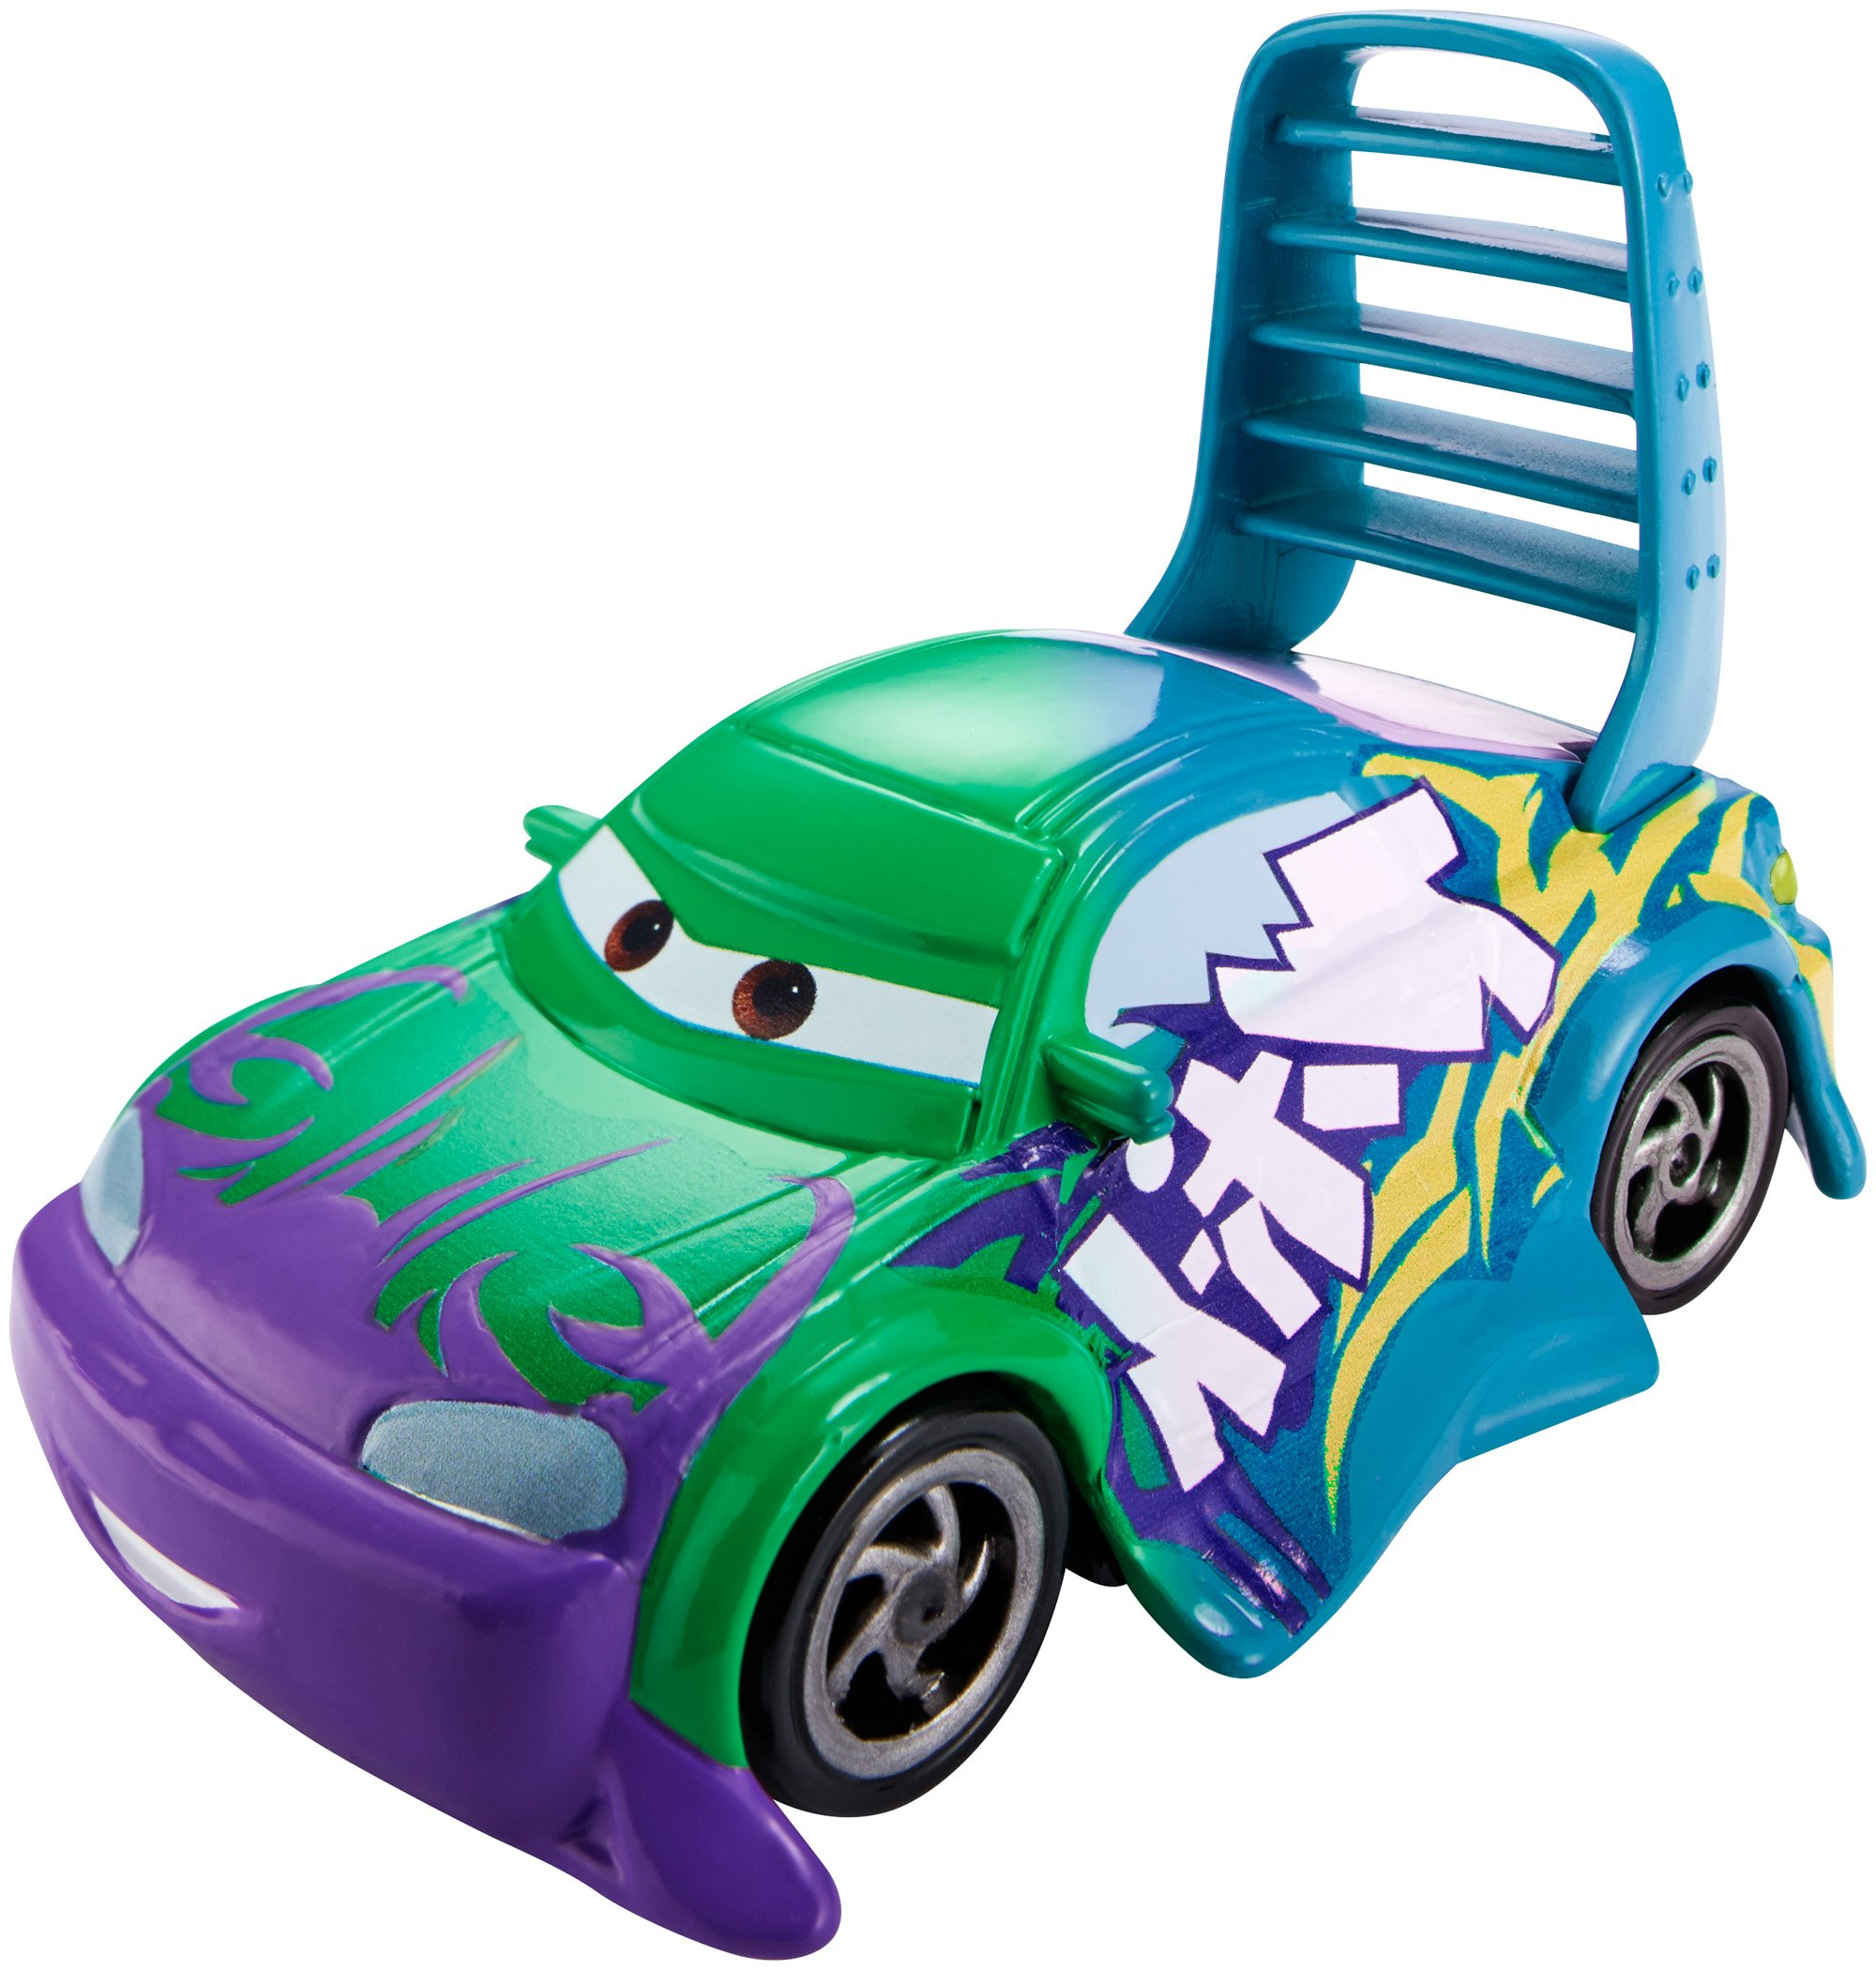 Disney Pixar Cars Color Changer Wingo Green To Turquoise Vehicle Toysplus